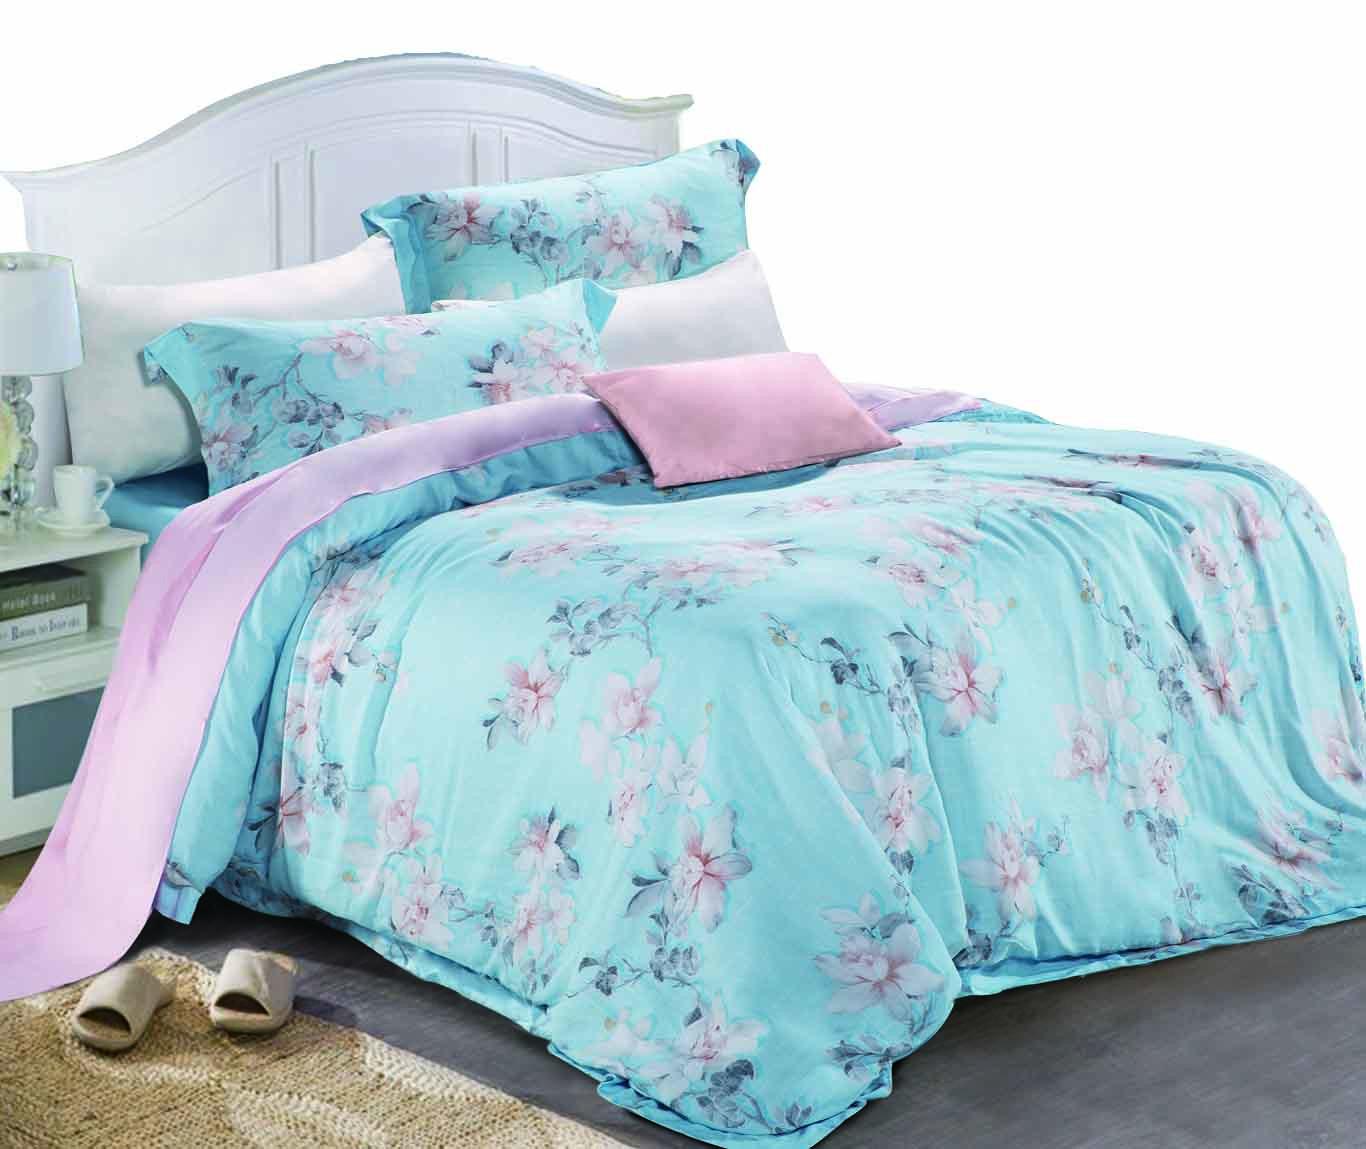 OEM modal sheets garden cup duver organic comforter